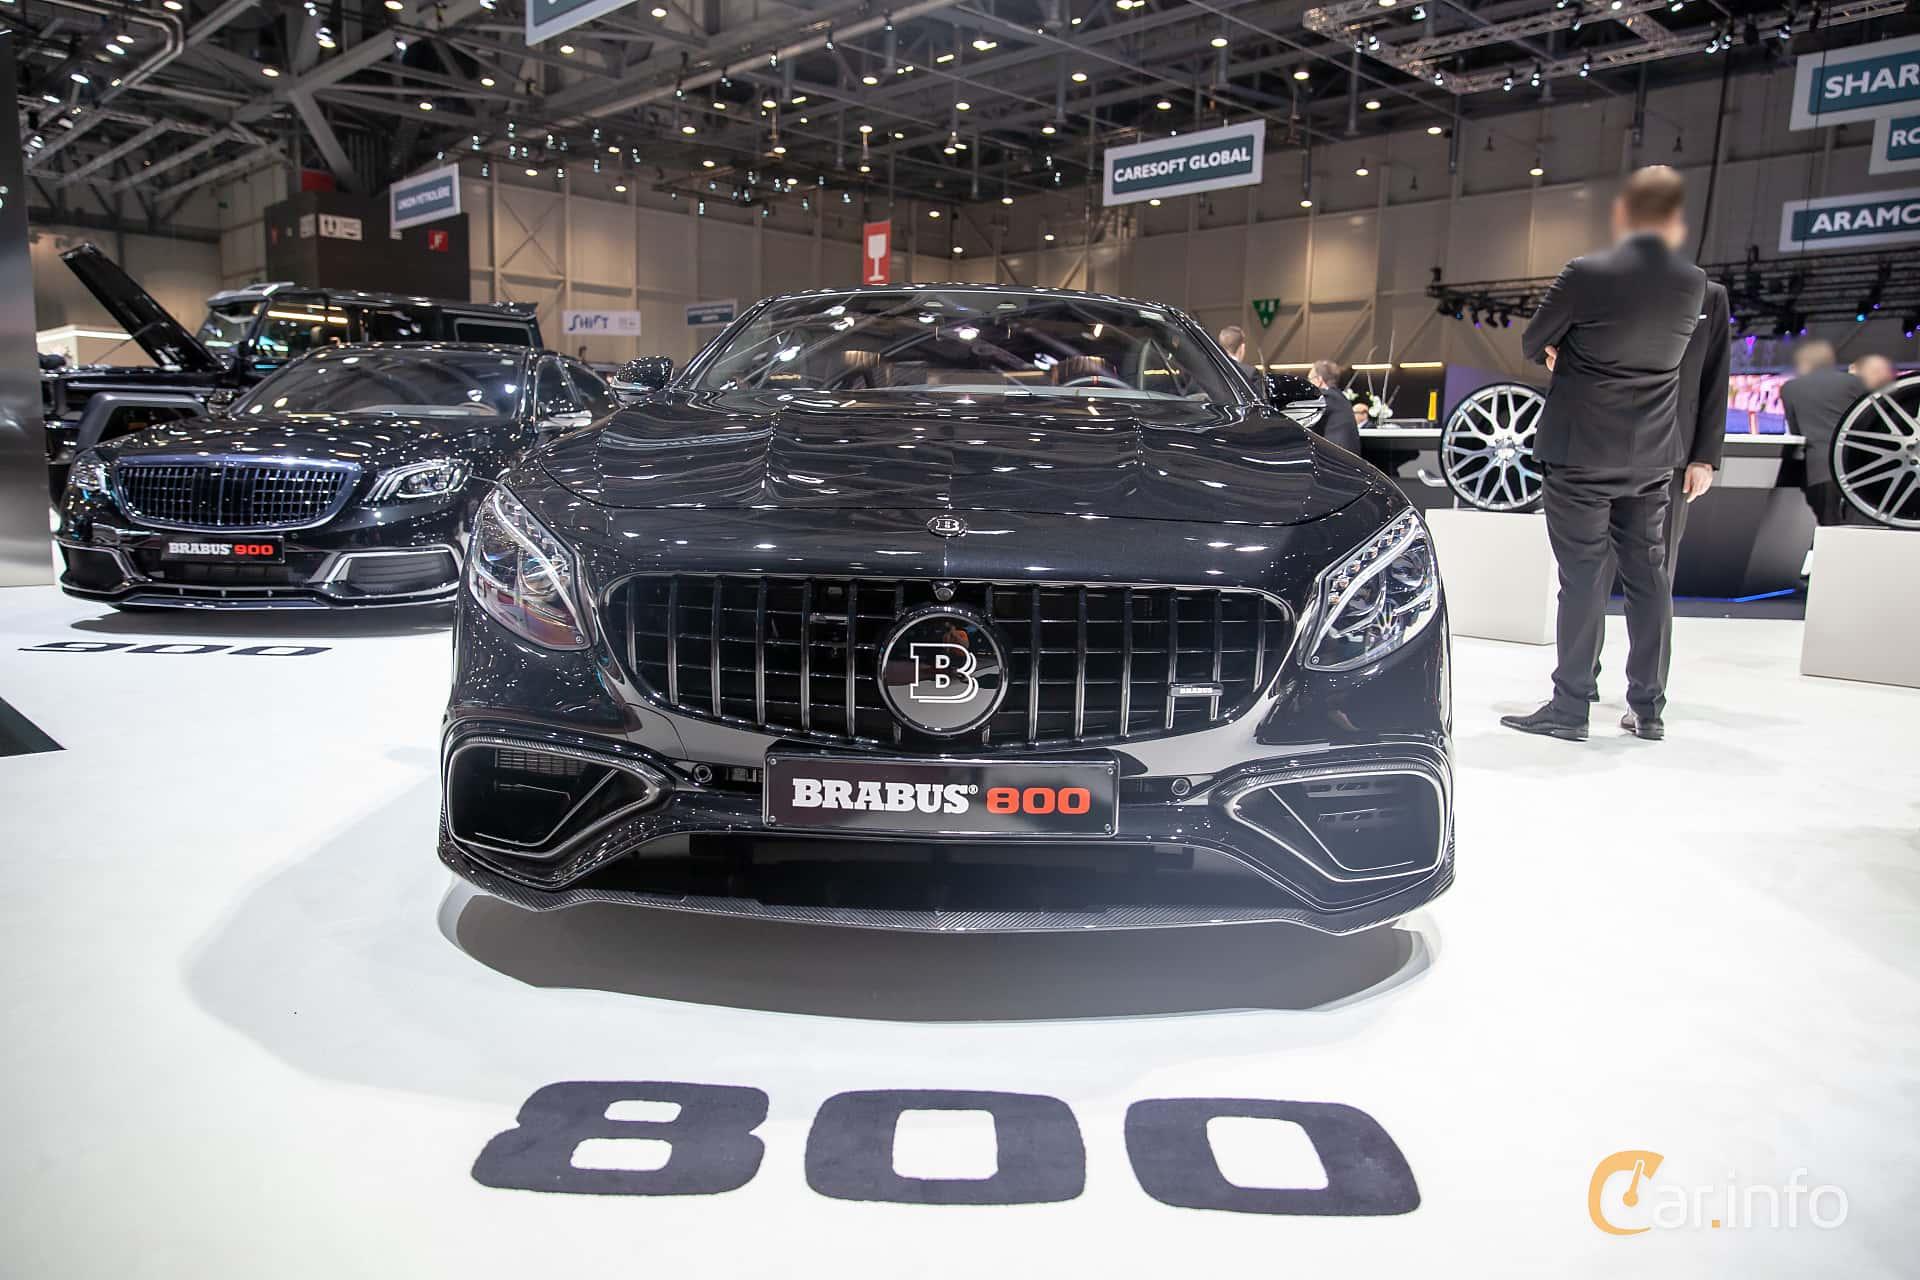 Brabus S 800 Coupé  , 800hp, 2019 at Geneva Motor Show 2019